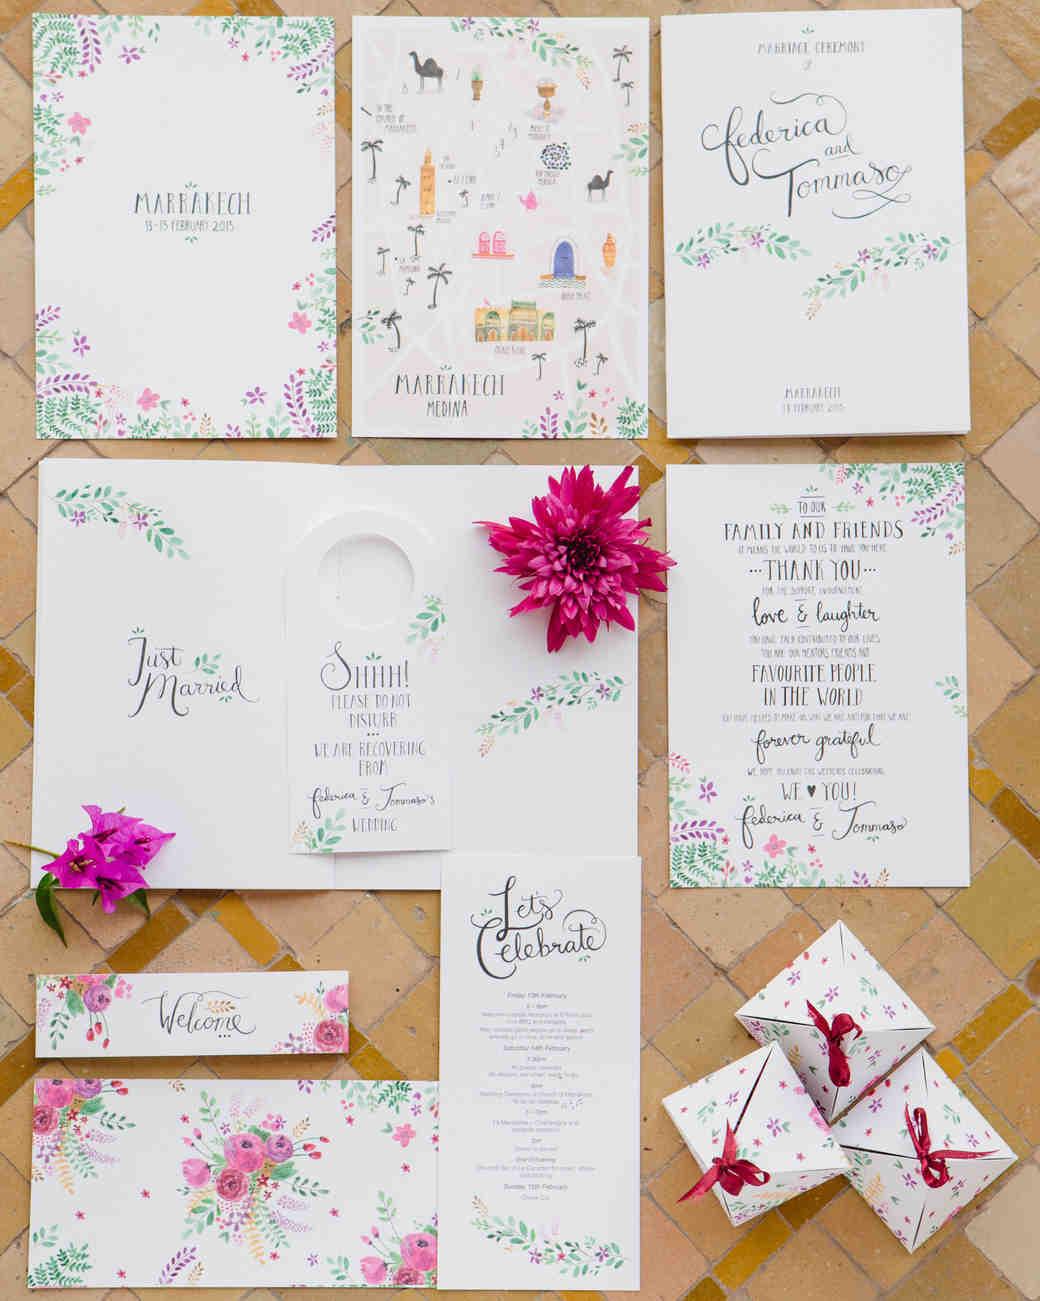 Wedding Stationery Styles For Every Personality | Martha Stewart Weddings